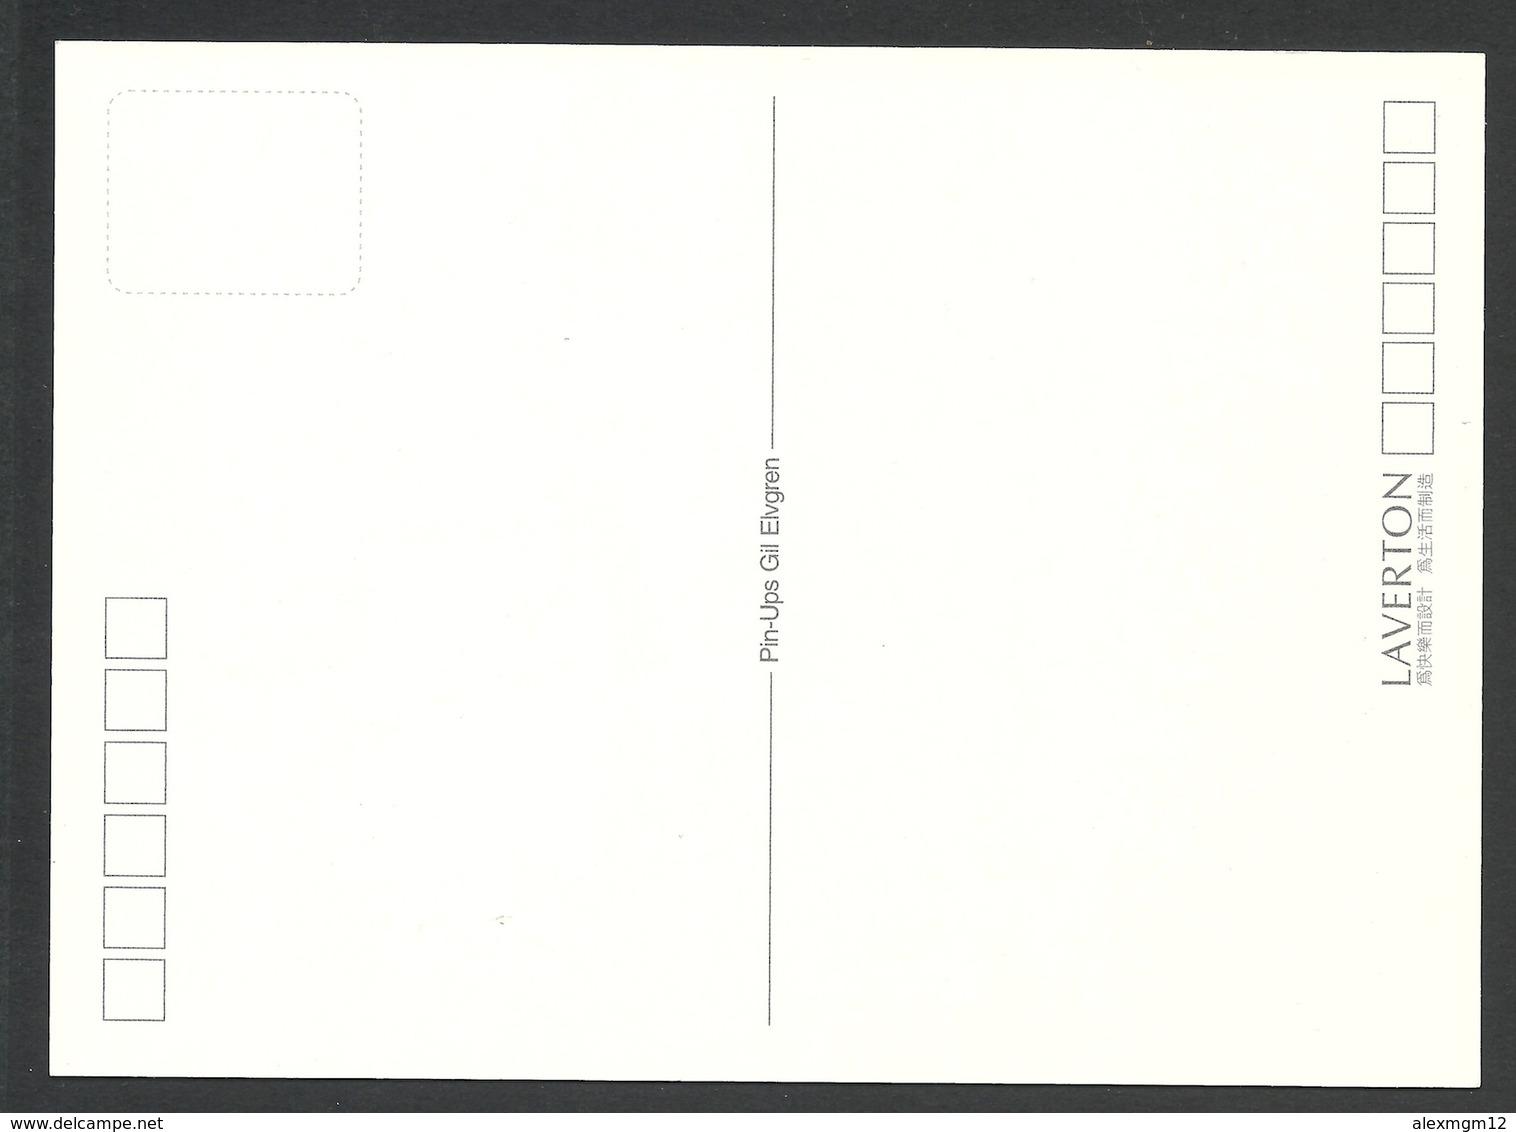 Gil Elvgren, Last Stand, 1961, Pin-Up. - Pin-Ups